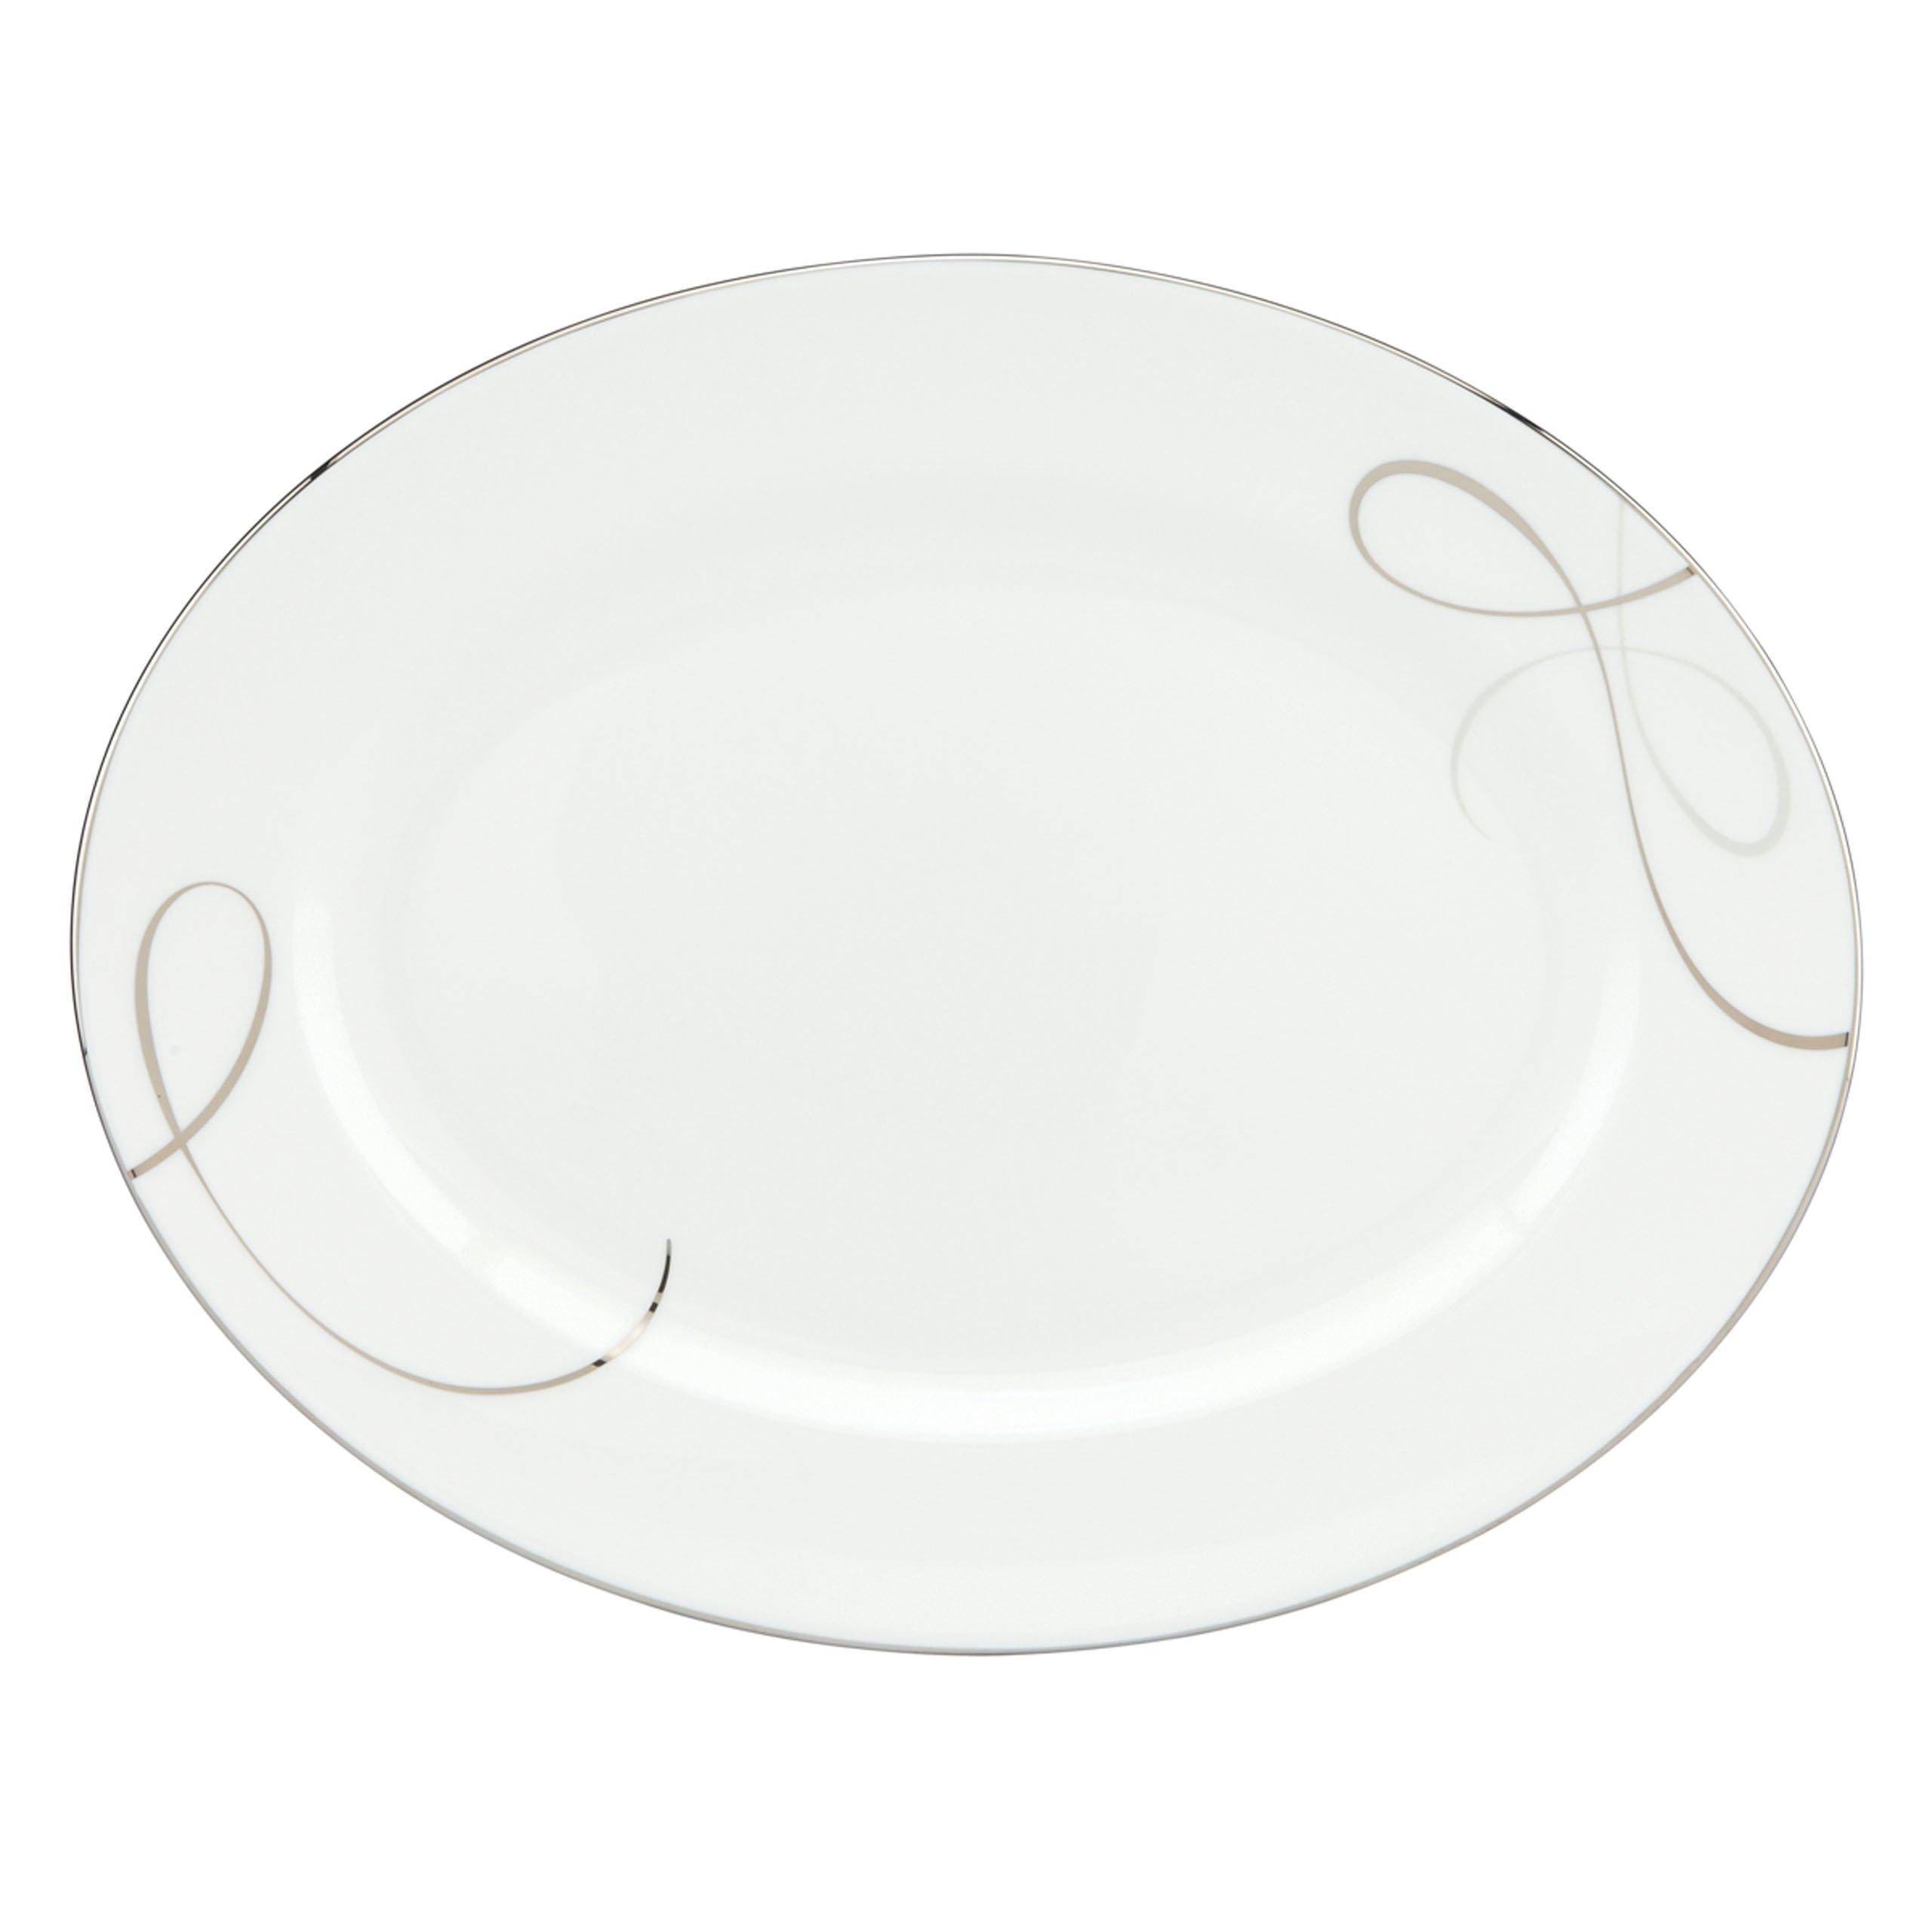 Lenox Adorn Oval Platter by Lenox